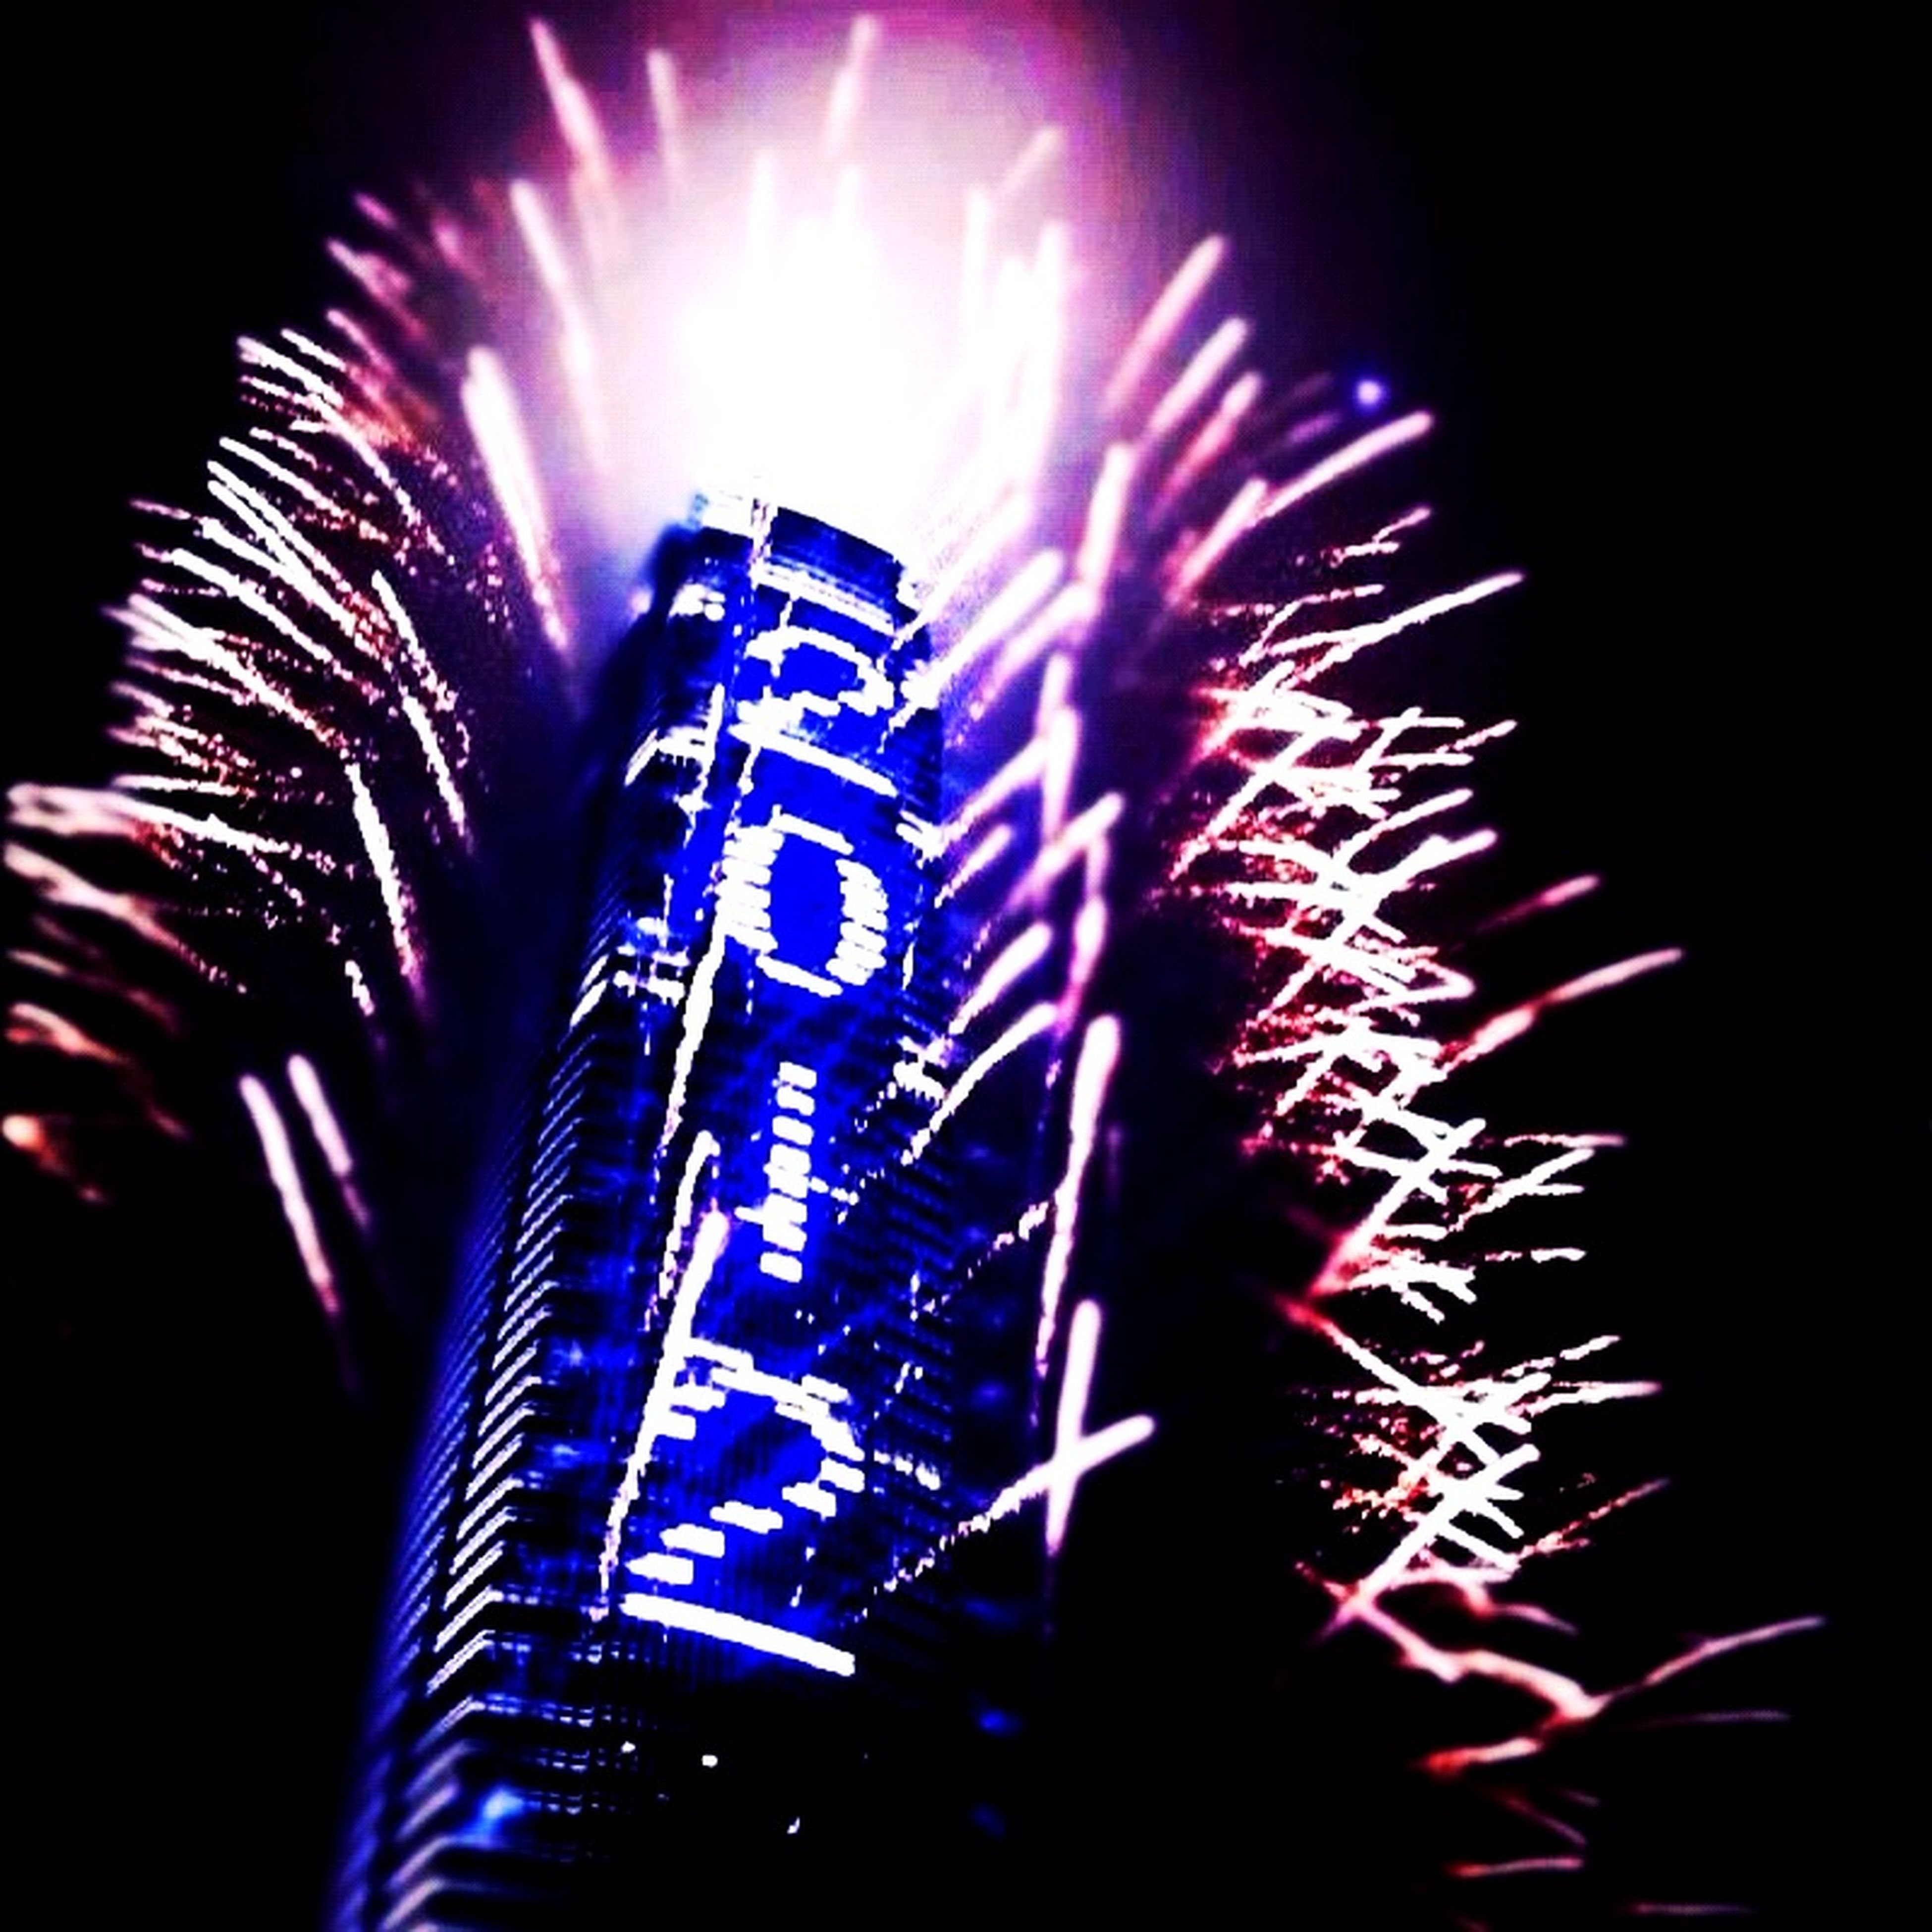 Happy New Year! at IFC Happy New Year!